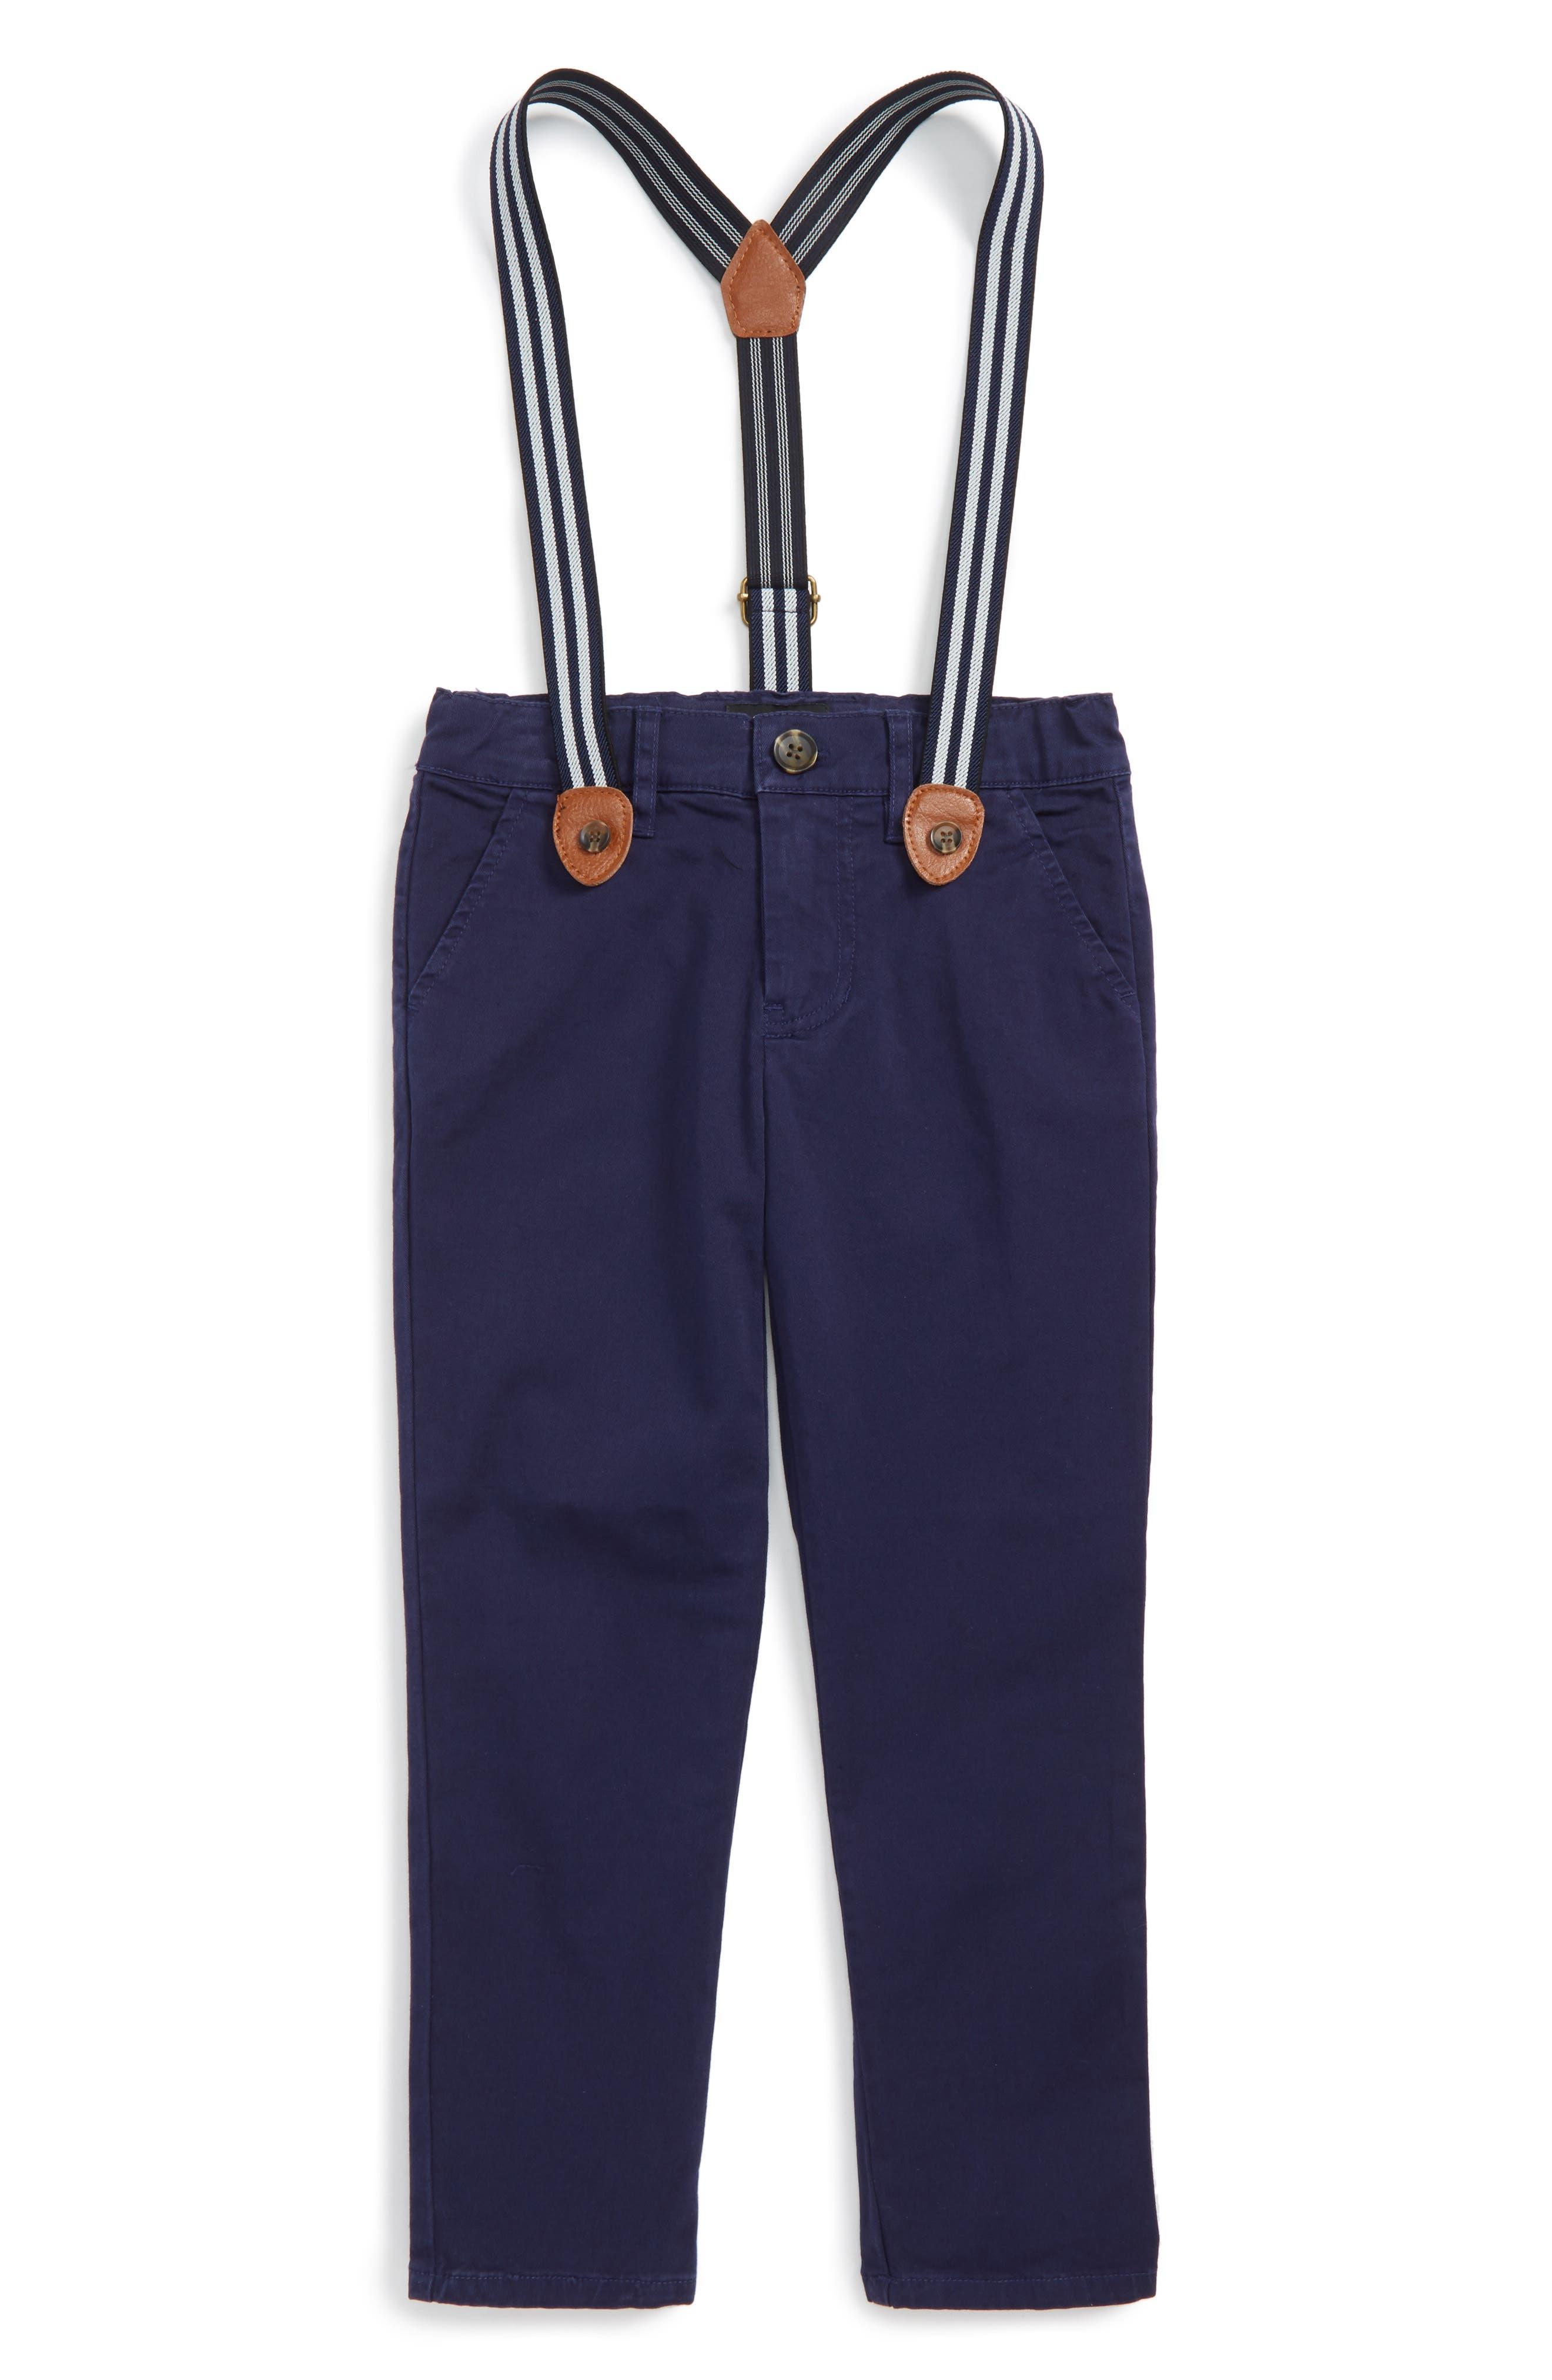 BARDOT JUNIOR Chinos & Suspenders Set